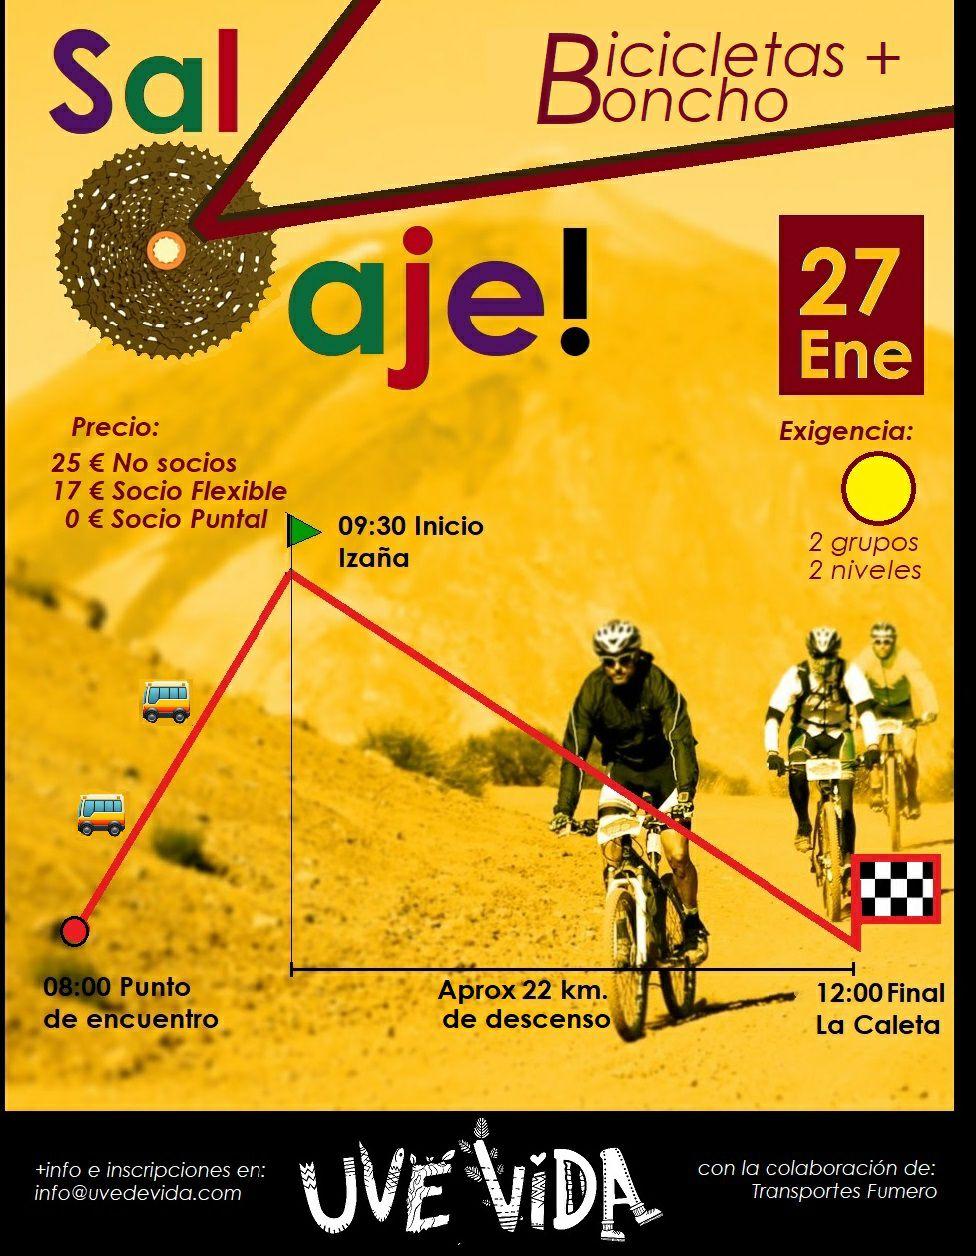 SalVaje Bicicletas + Boncho